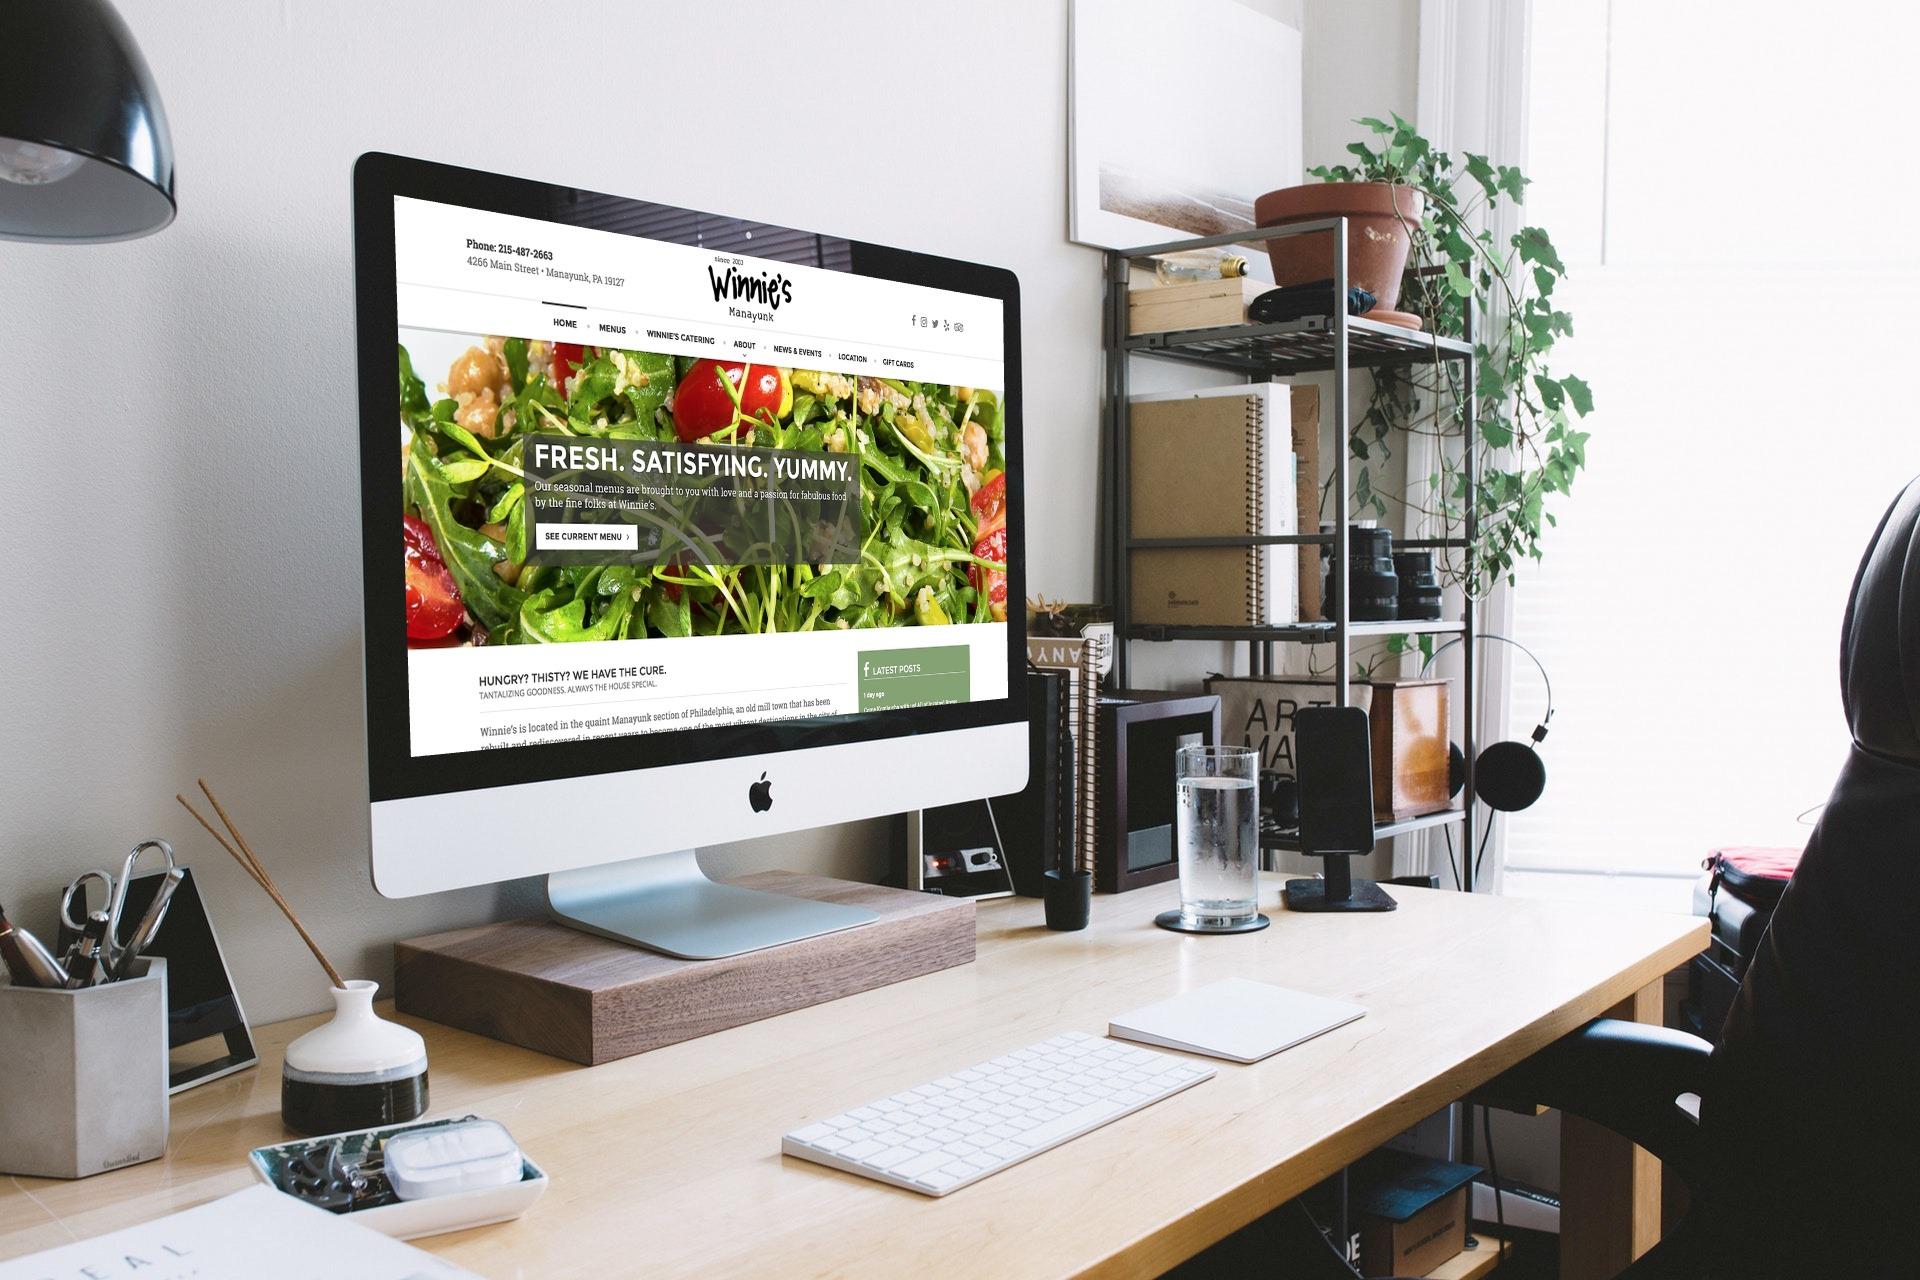 Winnie's Manayunk website on mobile phone